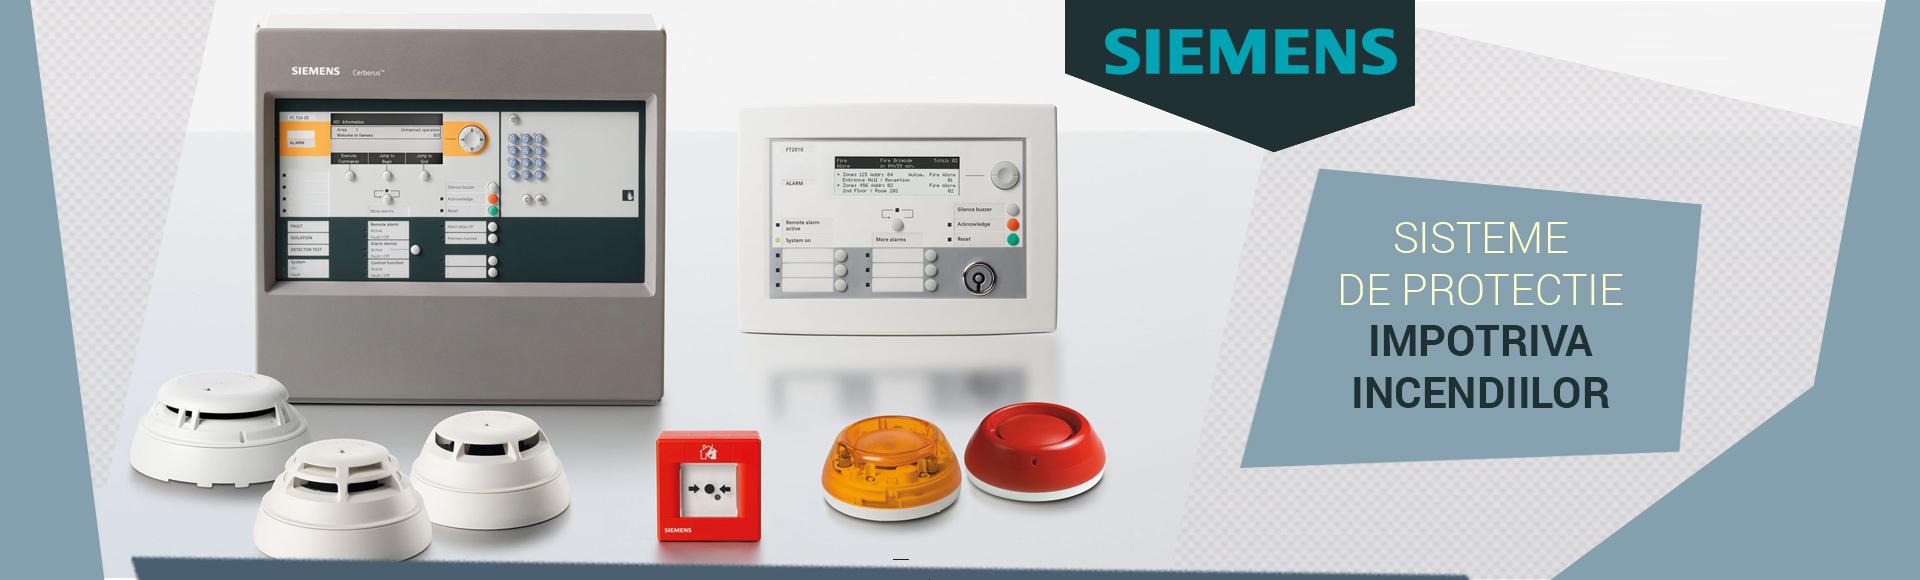 SET COMPLET SIEMENS IC60M CU SIRENA DE EXTERIOR 1100 LEI + TVA